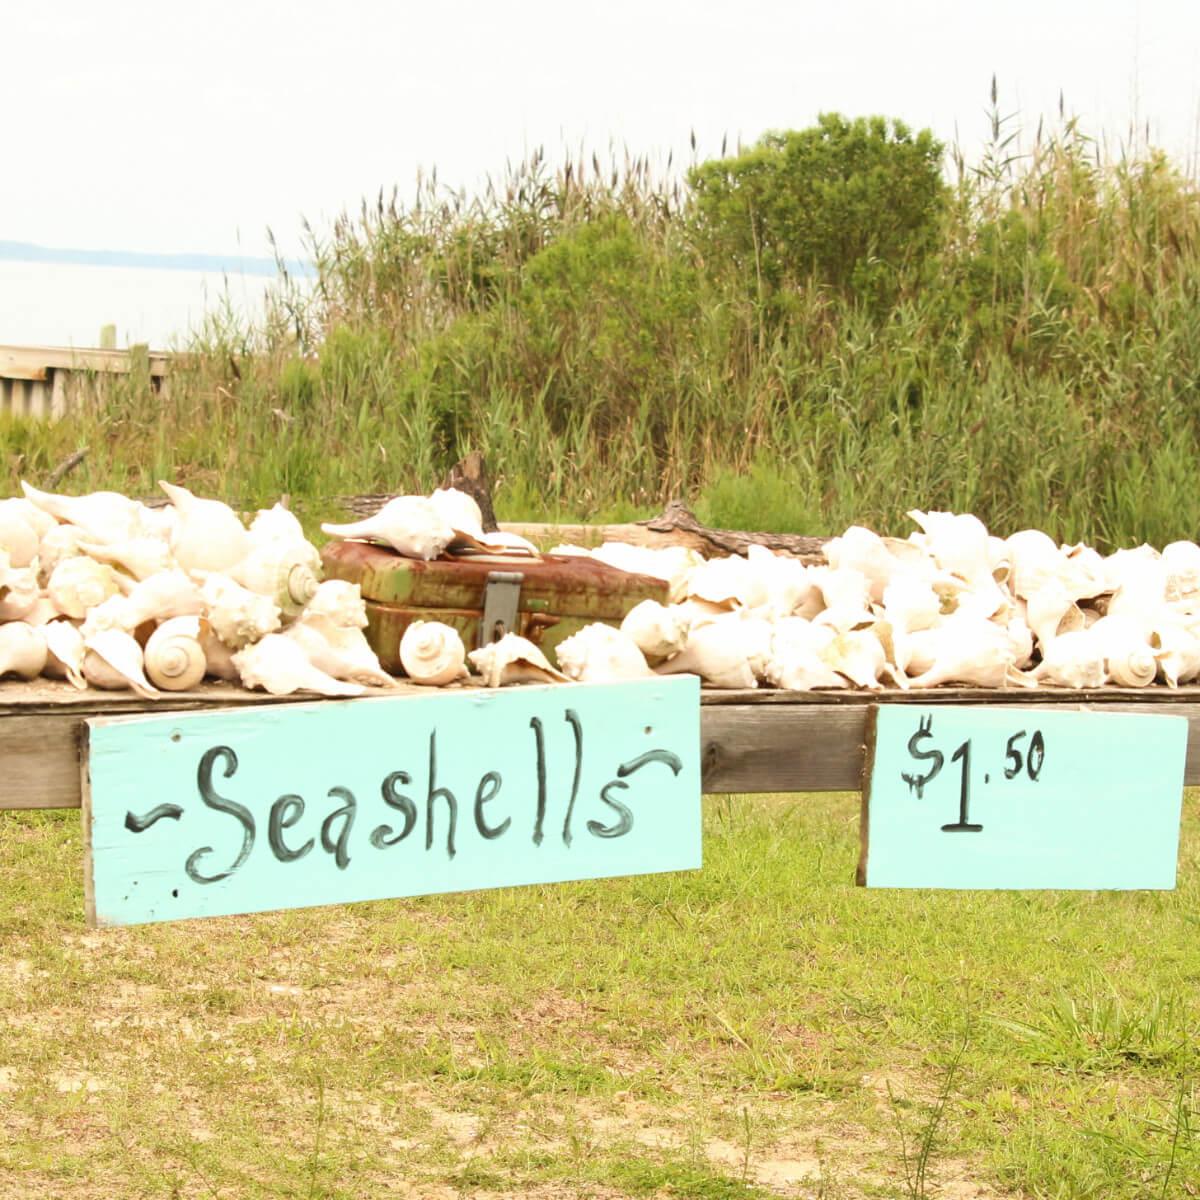 Seashell stand